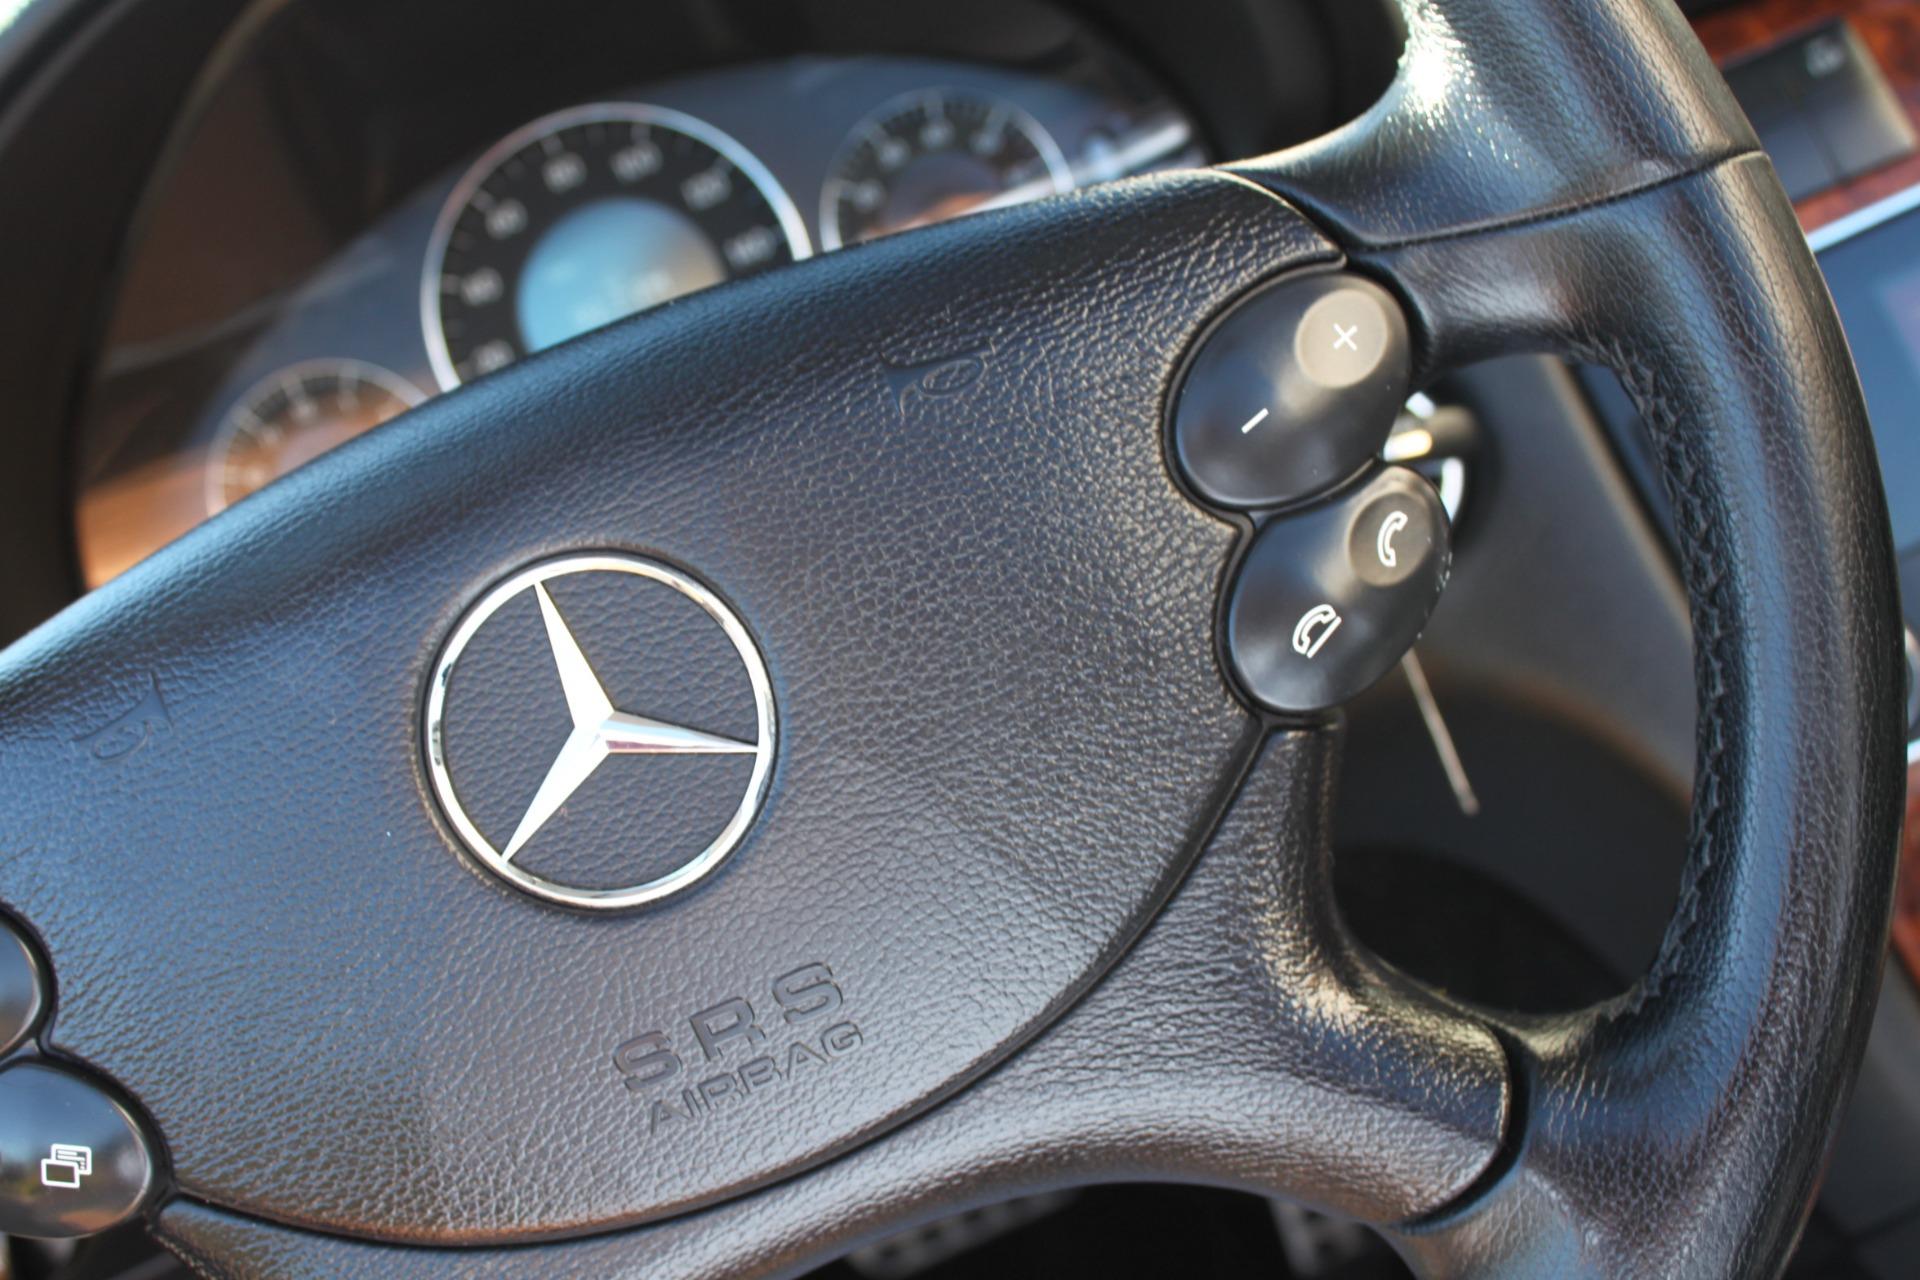 Used-2006-Mercedes-Benz-CLK-Class-CLK350-Cabriolet-35L-Range-Rover